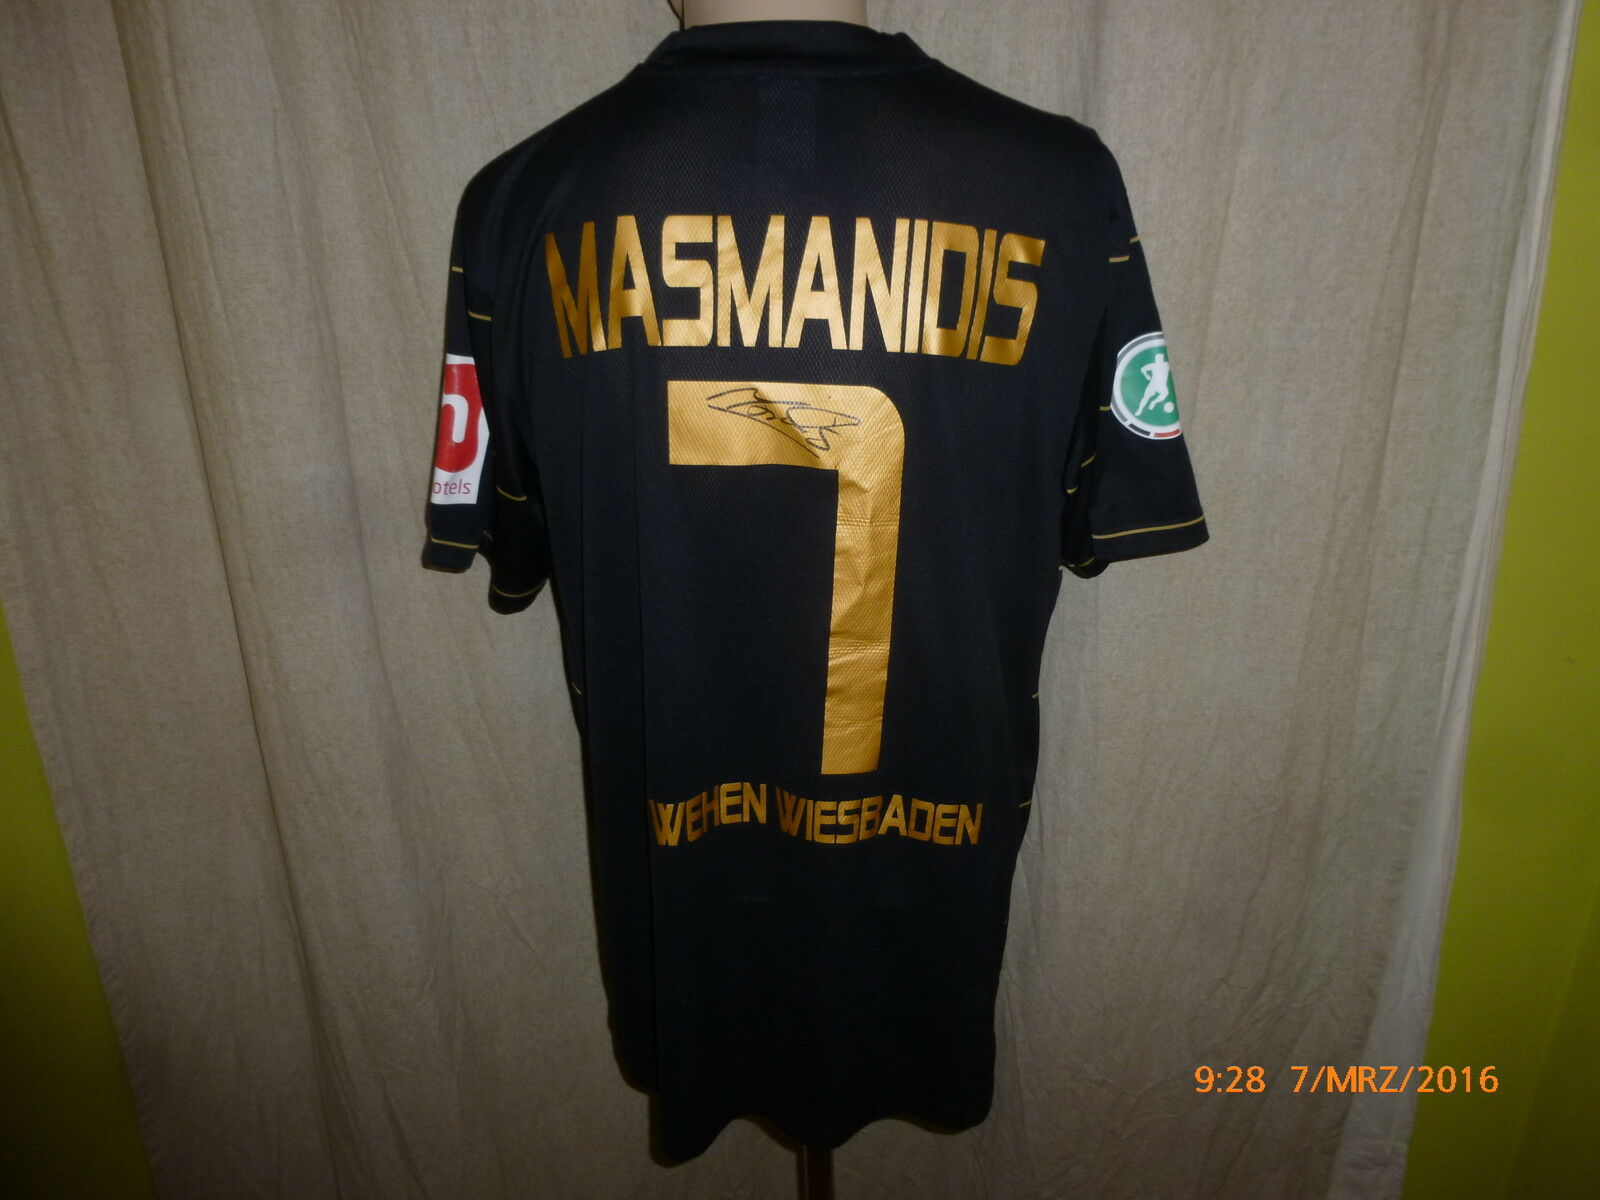 SV SV SV Wehen Wiesbaden Nike Auswärts Matchworn Trikot 2010 11 + Nr.7 Masmanidis Gr.M c02617